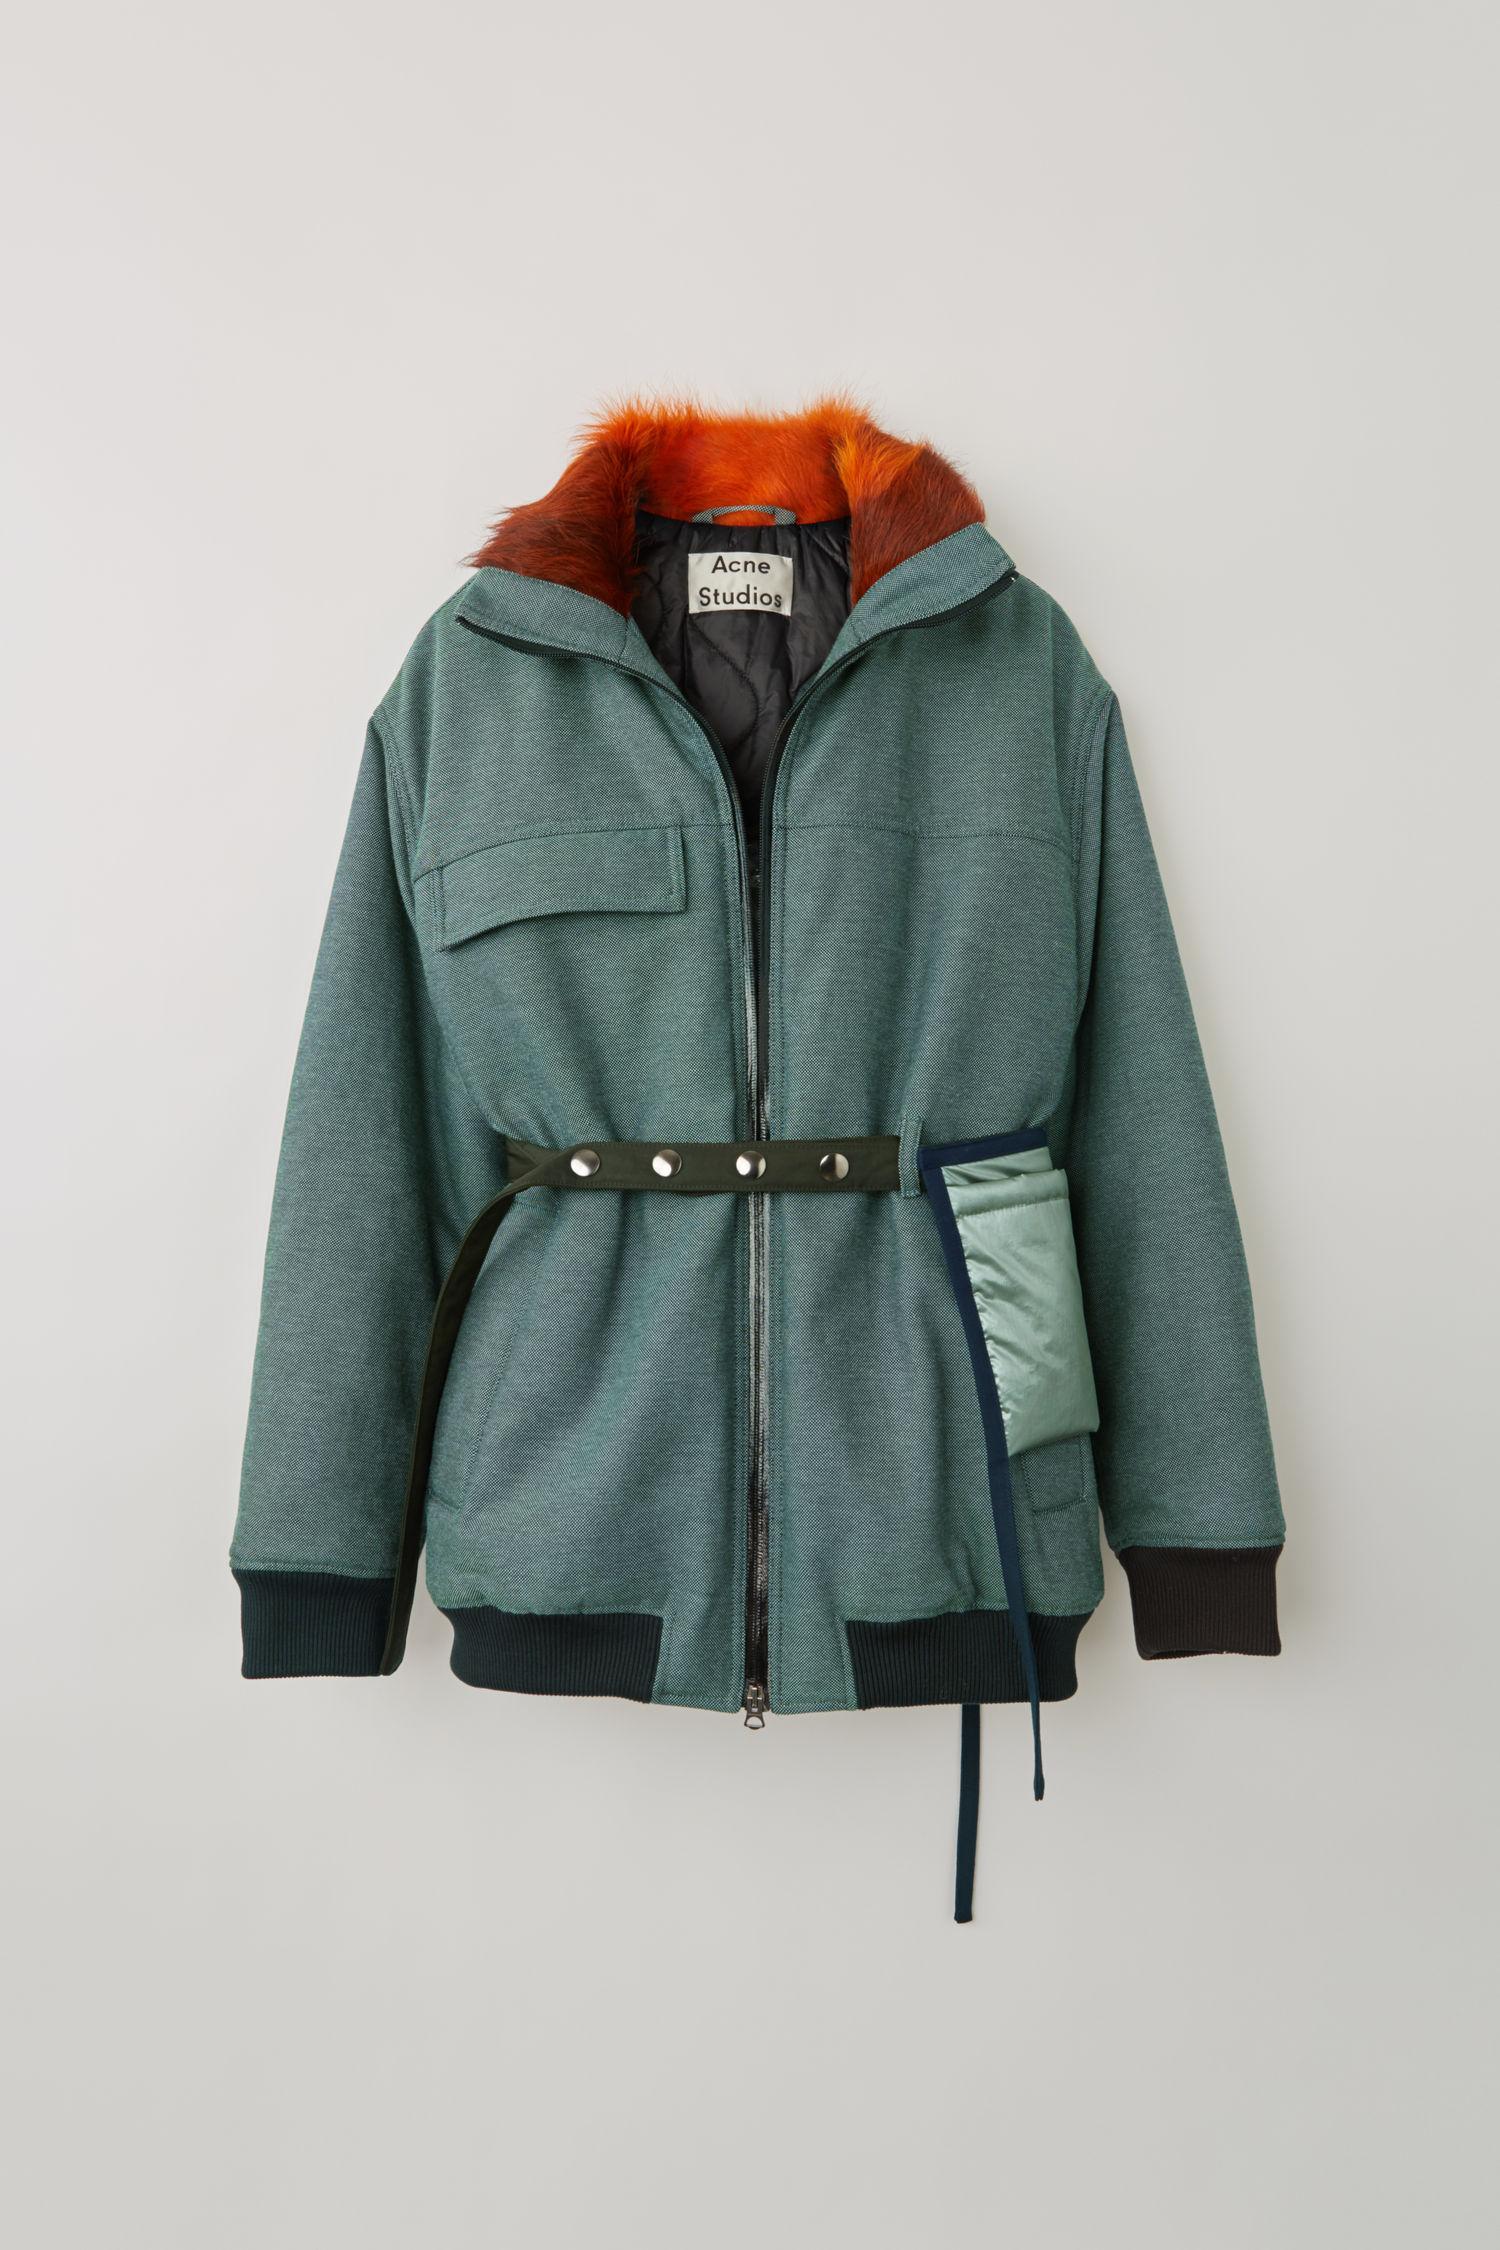 acne_studios_Reflective_padded_jacket_pastel_green_1.jpg